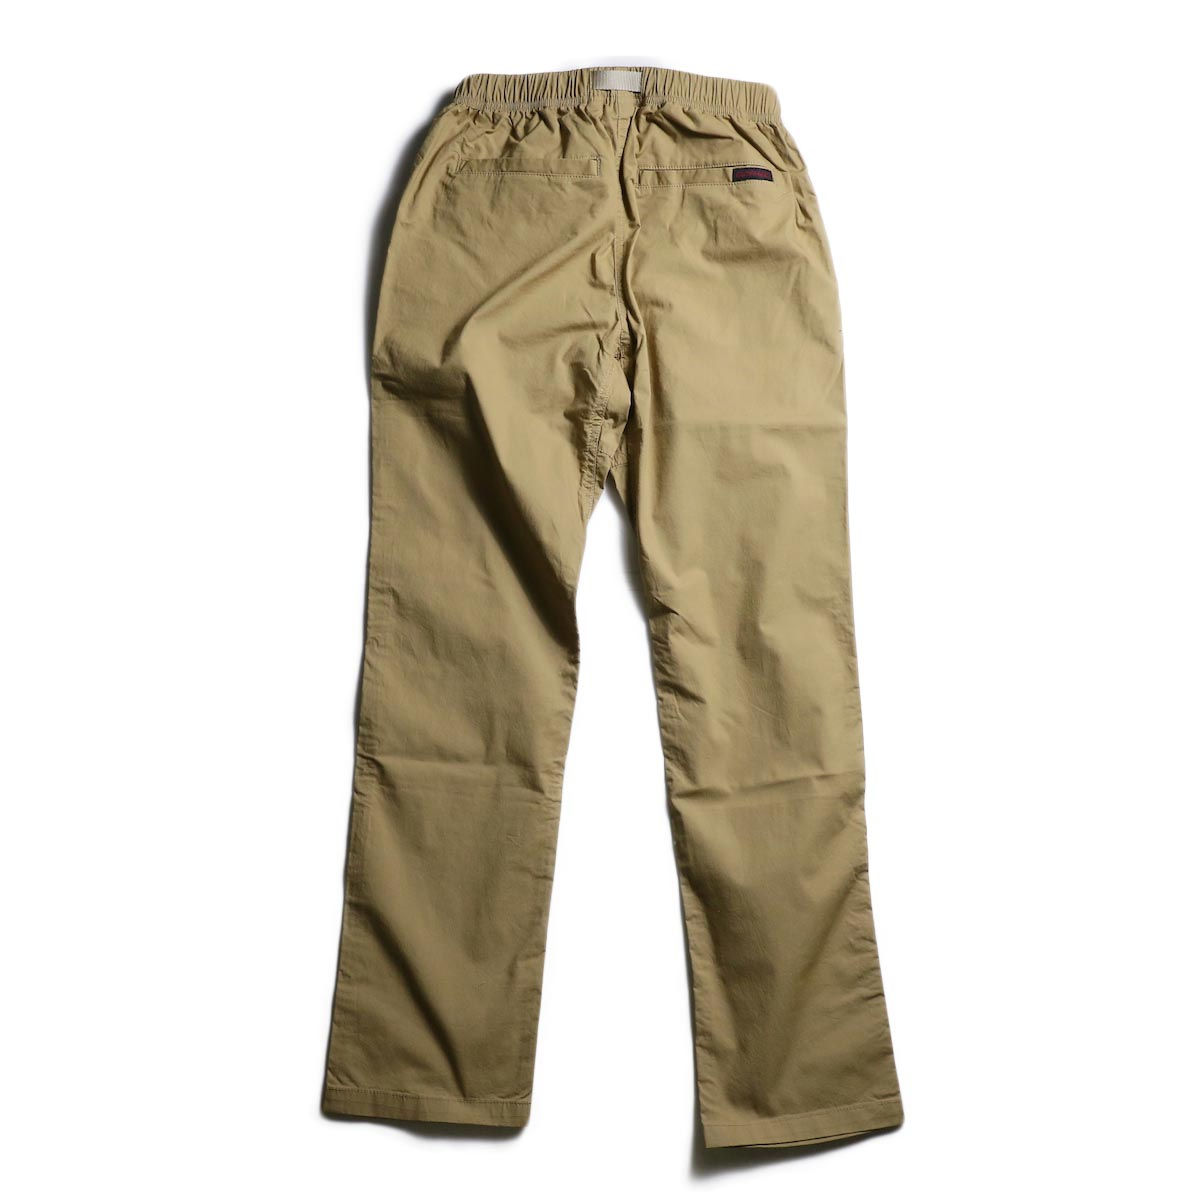 GRAMICCI / Weather NN-Pants Just Cut (Sand)背面